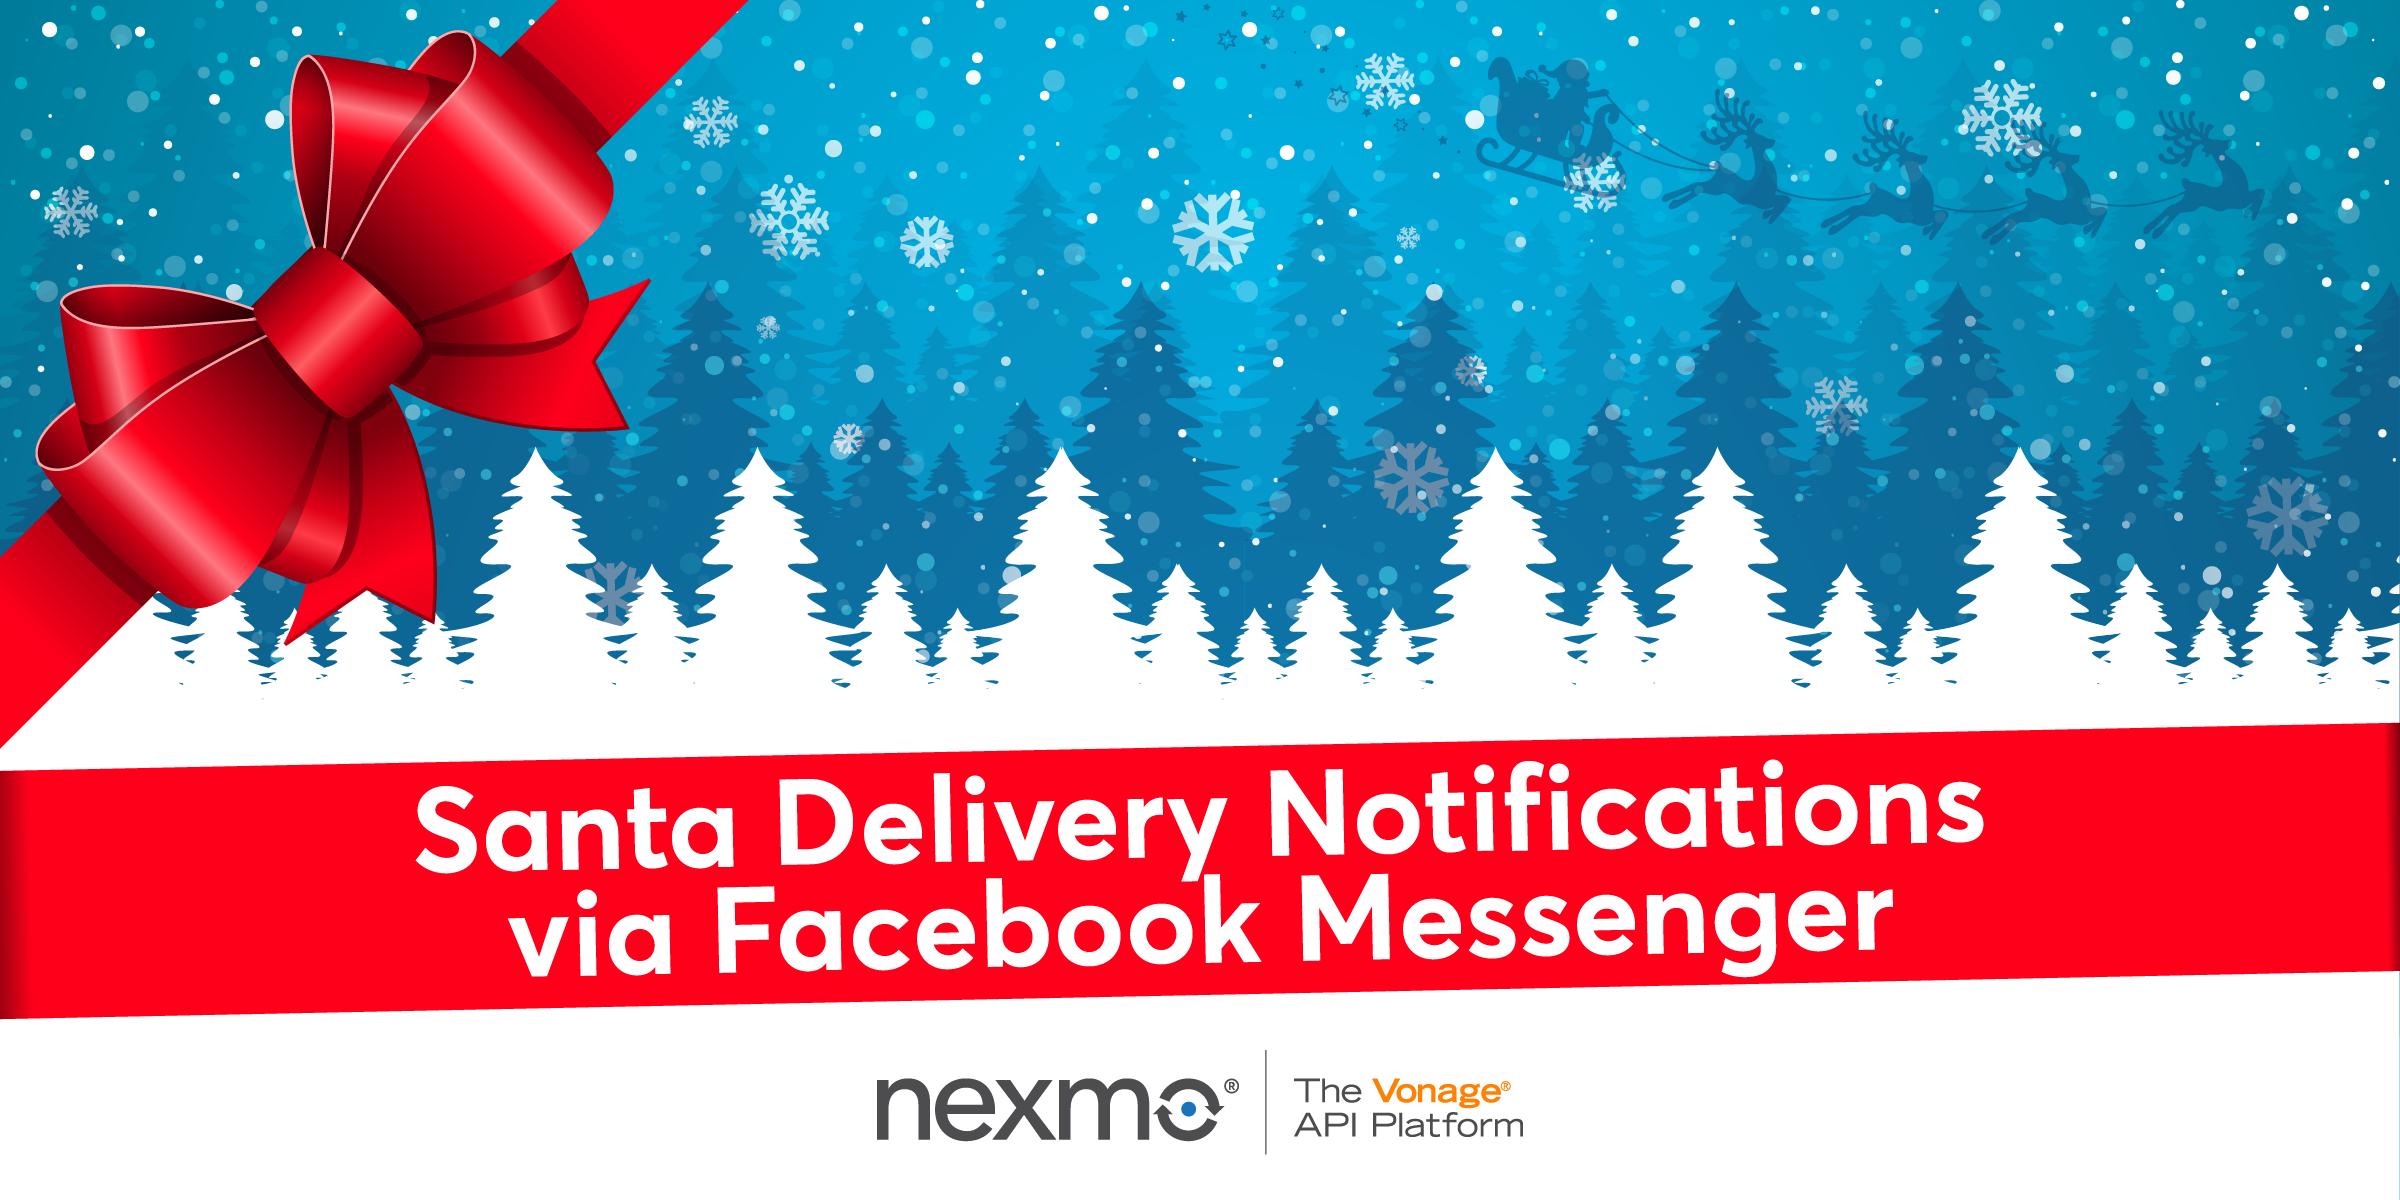 Santa Delivery Notifications via Facebook Messenger